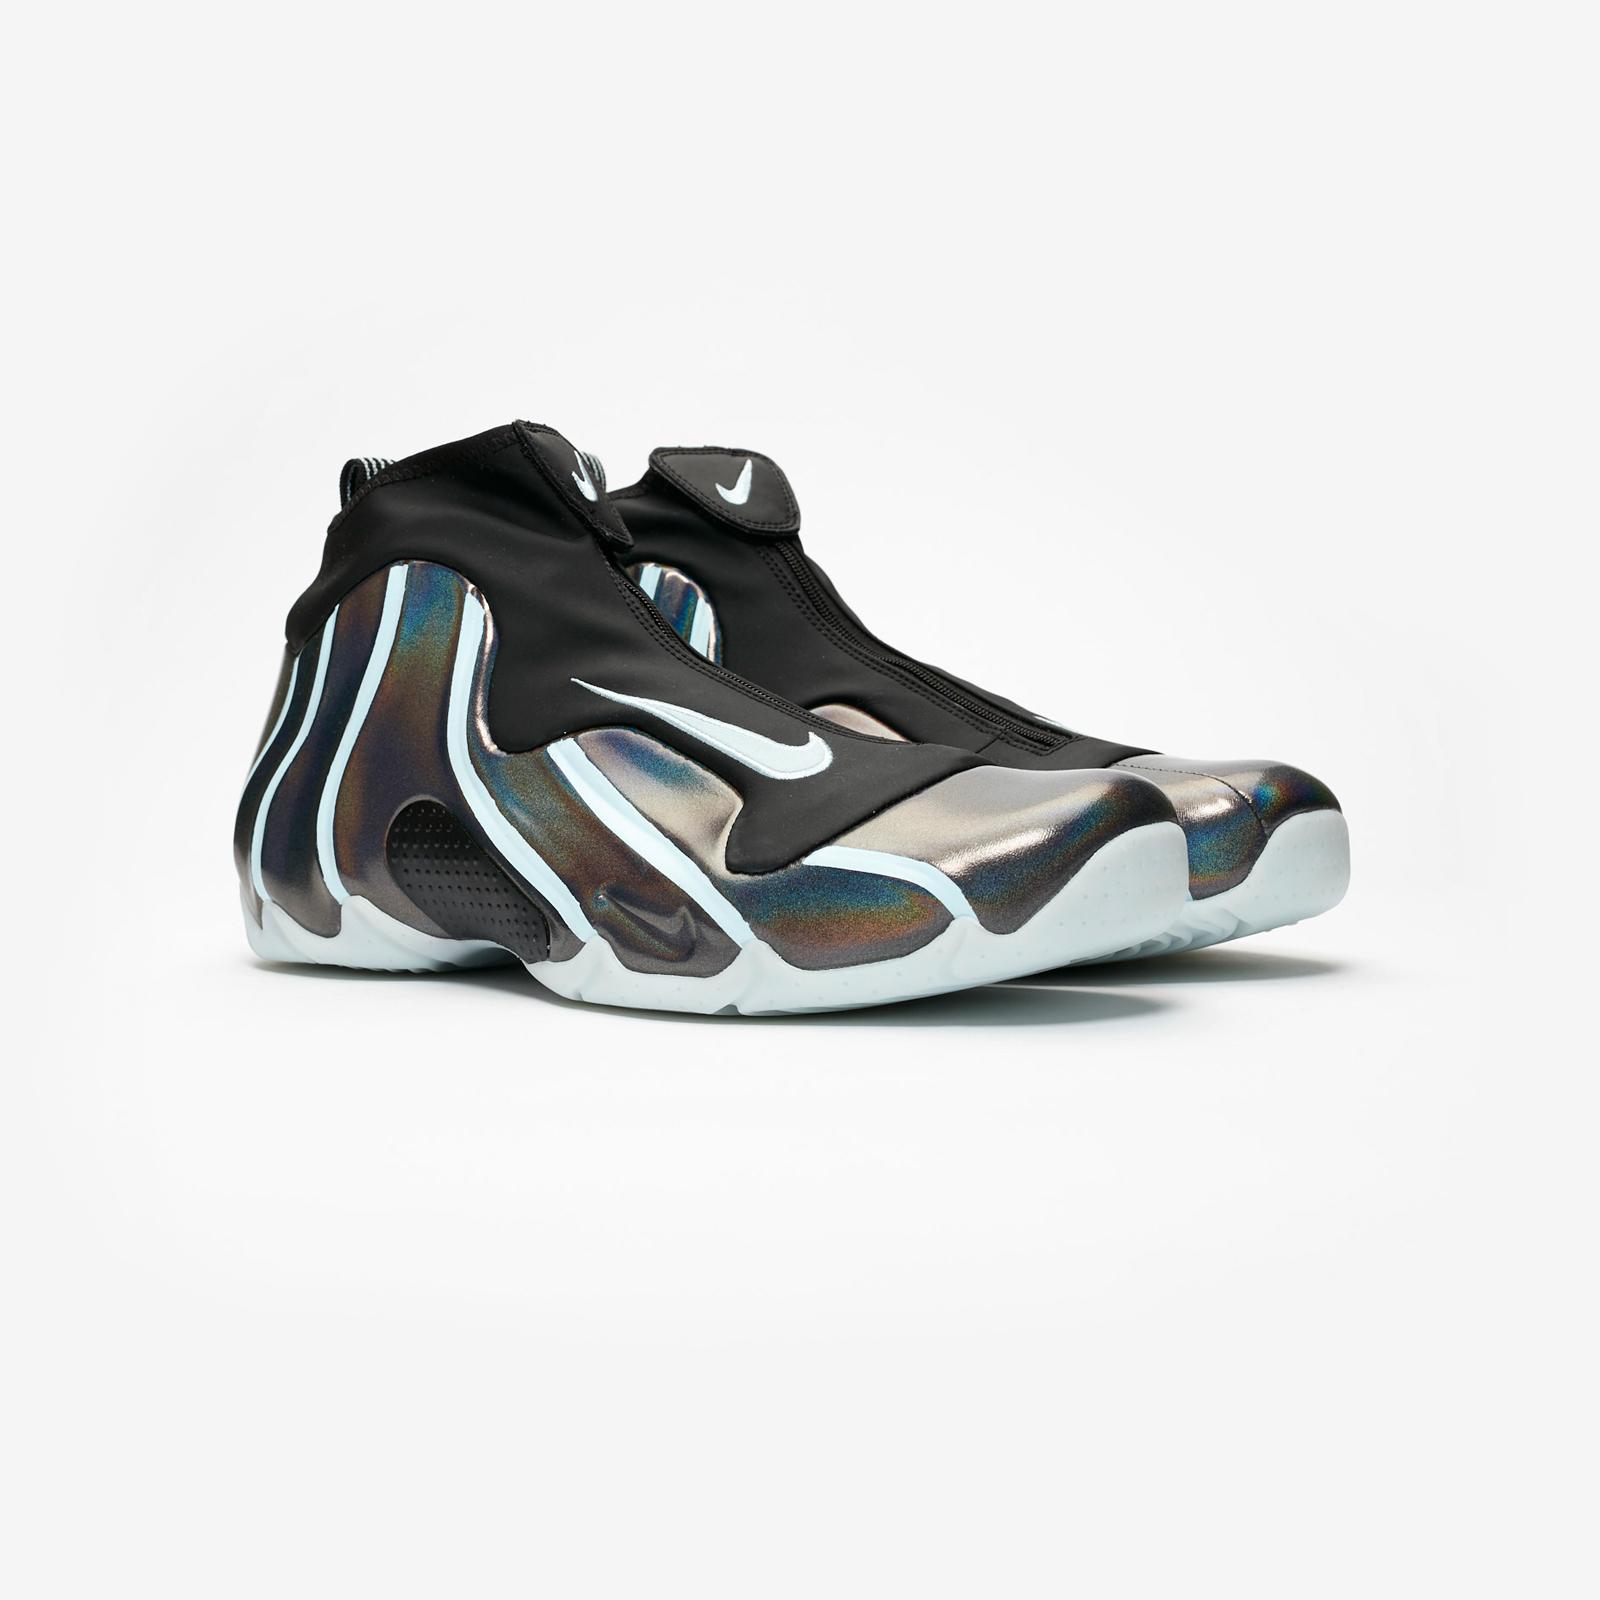 new concept 8d883 254da Nike Air Flightposite - Ao9378-001 - Sneakersnstuff   sneakers   streetwear  online since 1999